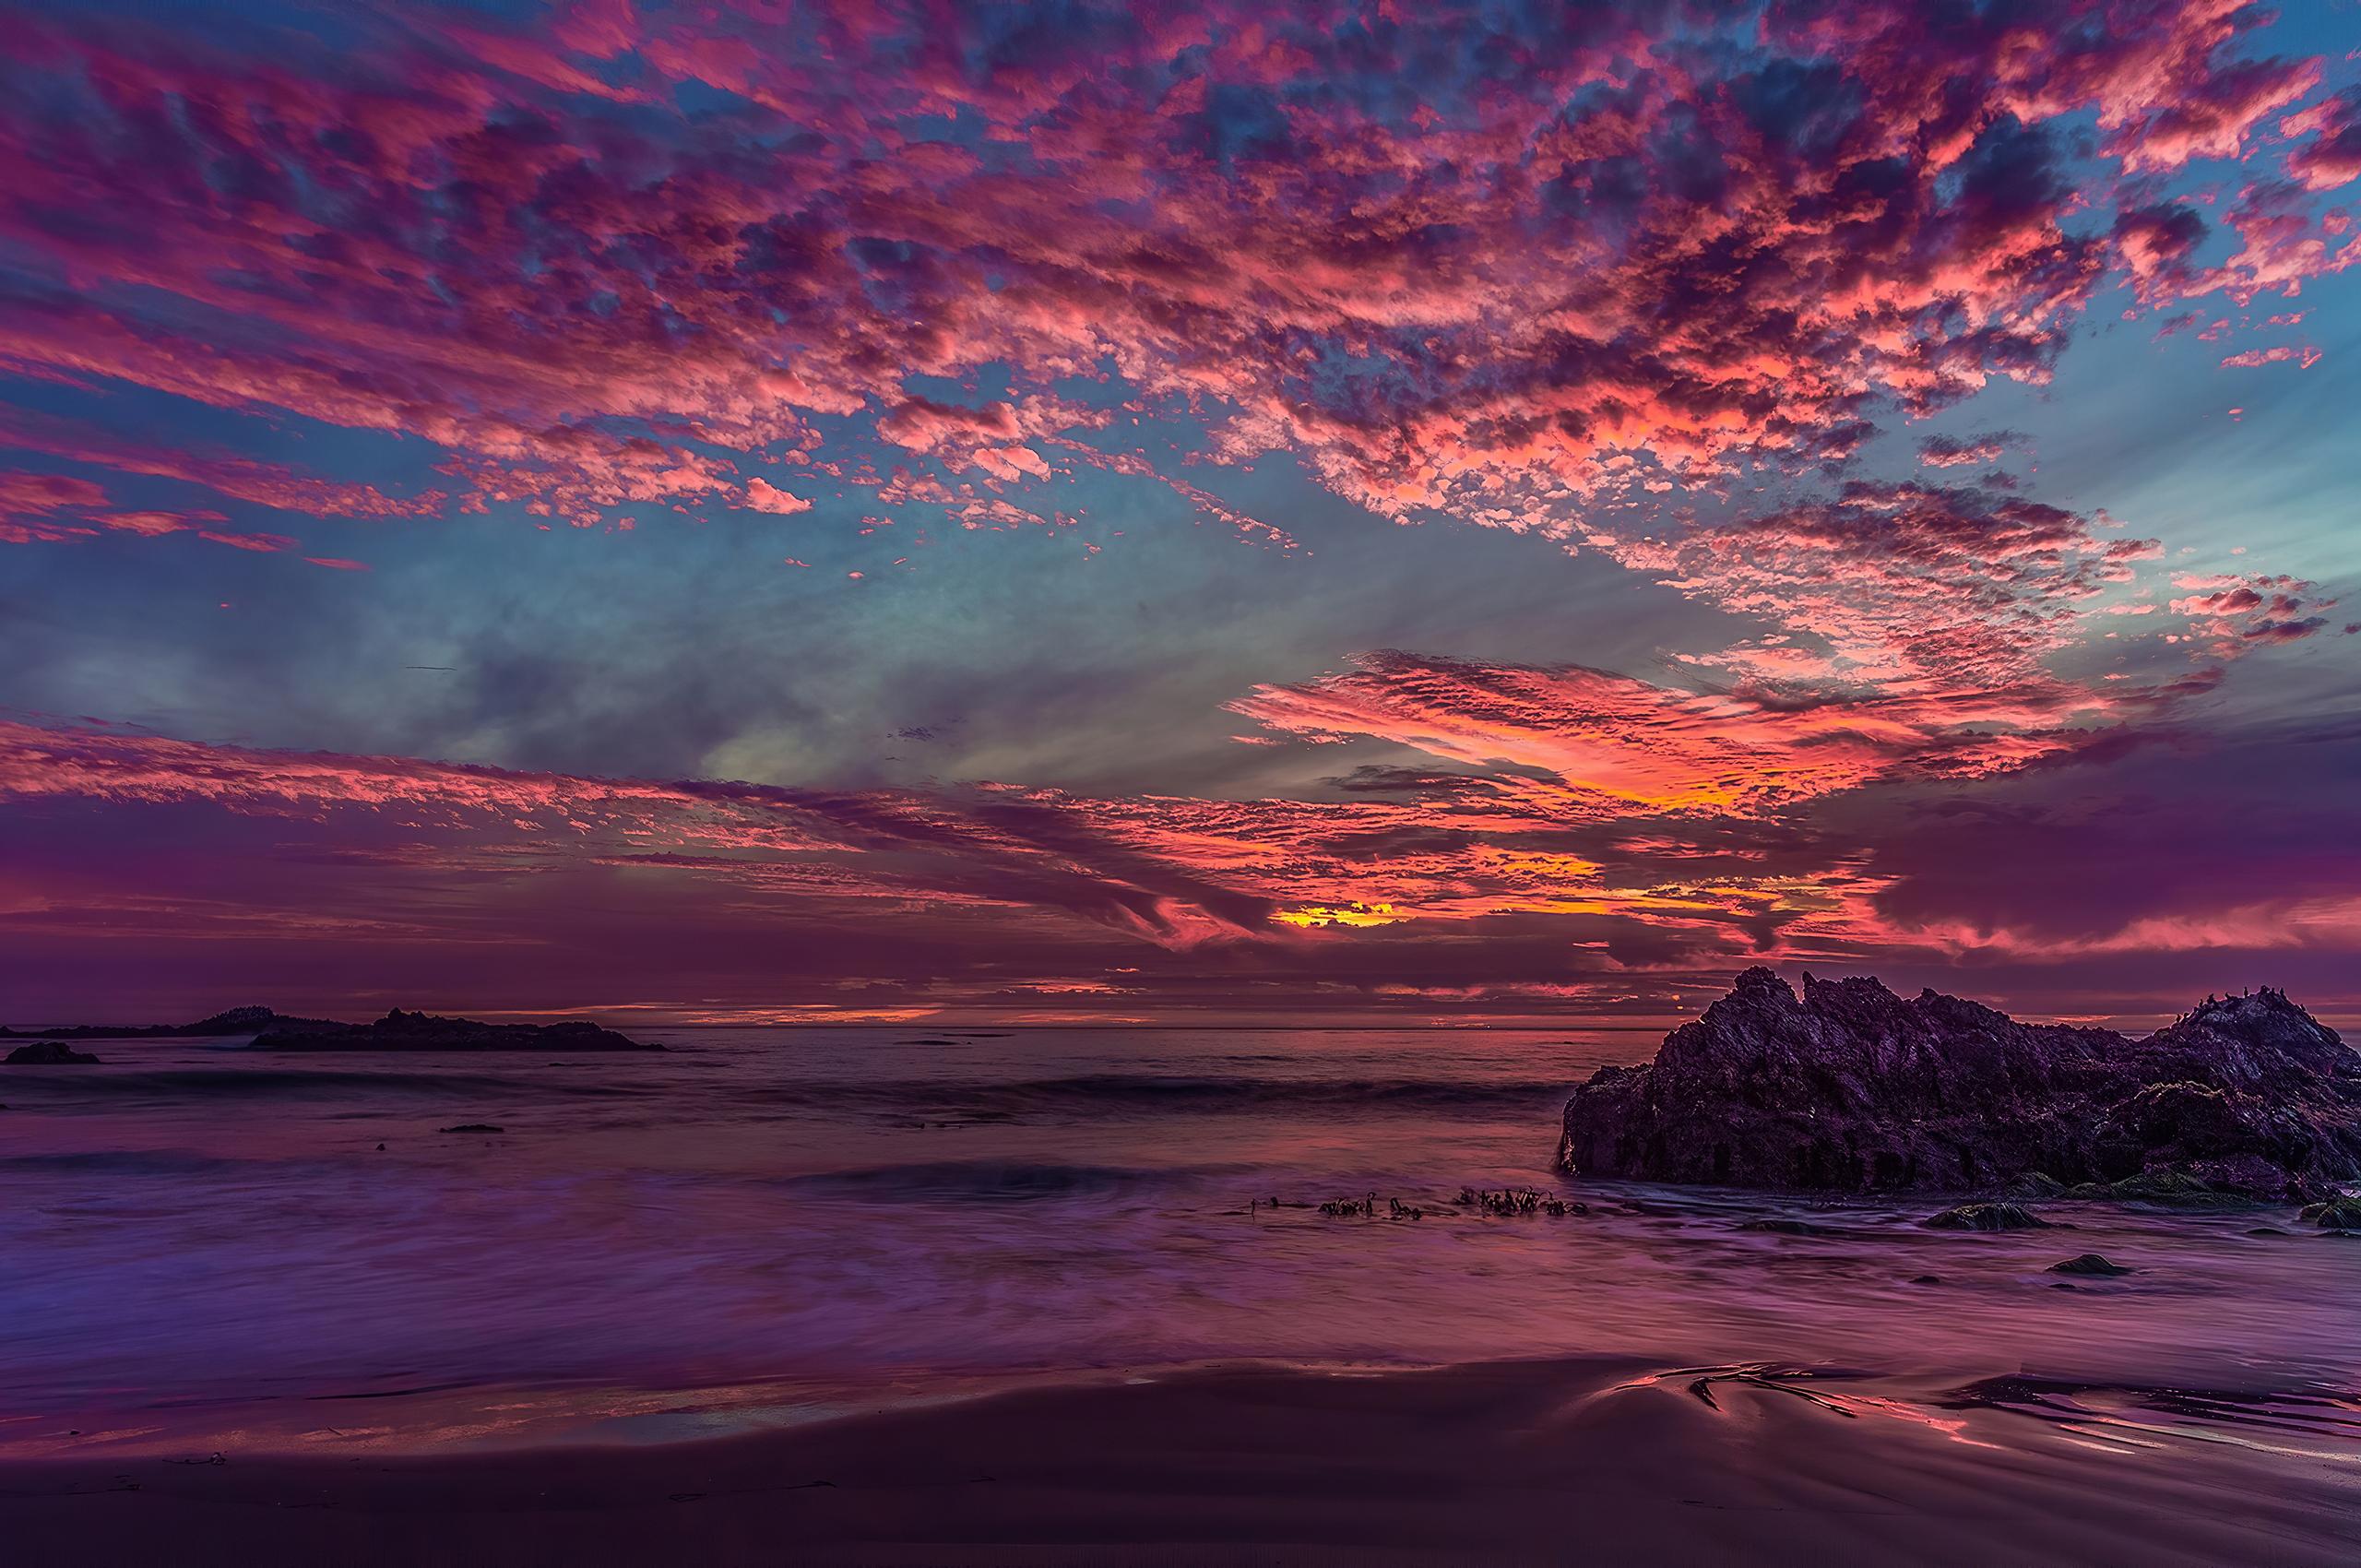 red-rock-clouds-sunset-4k-3z.jpg